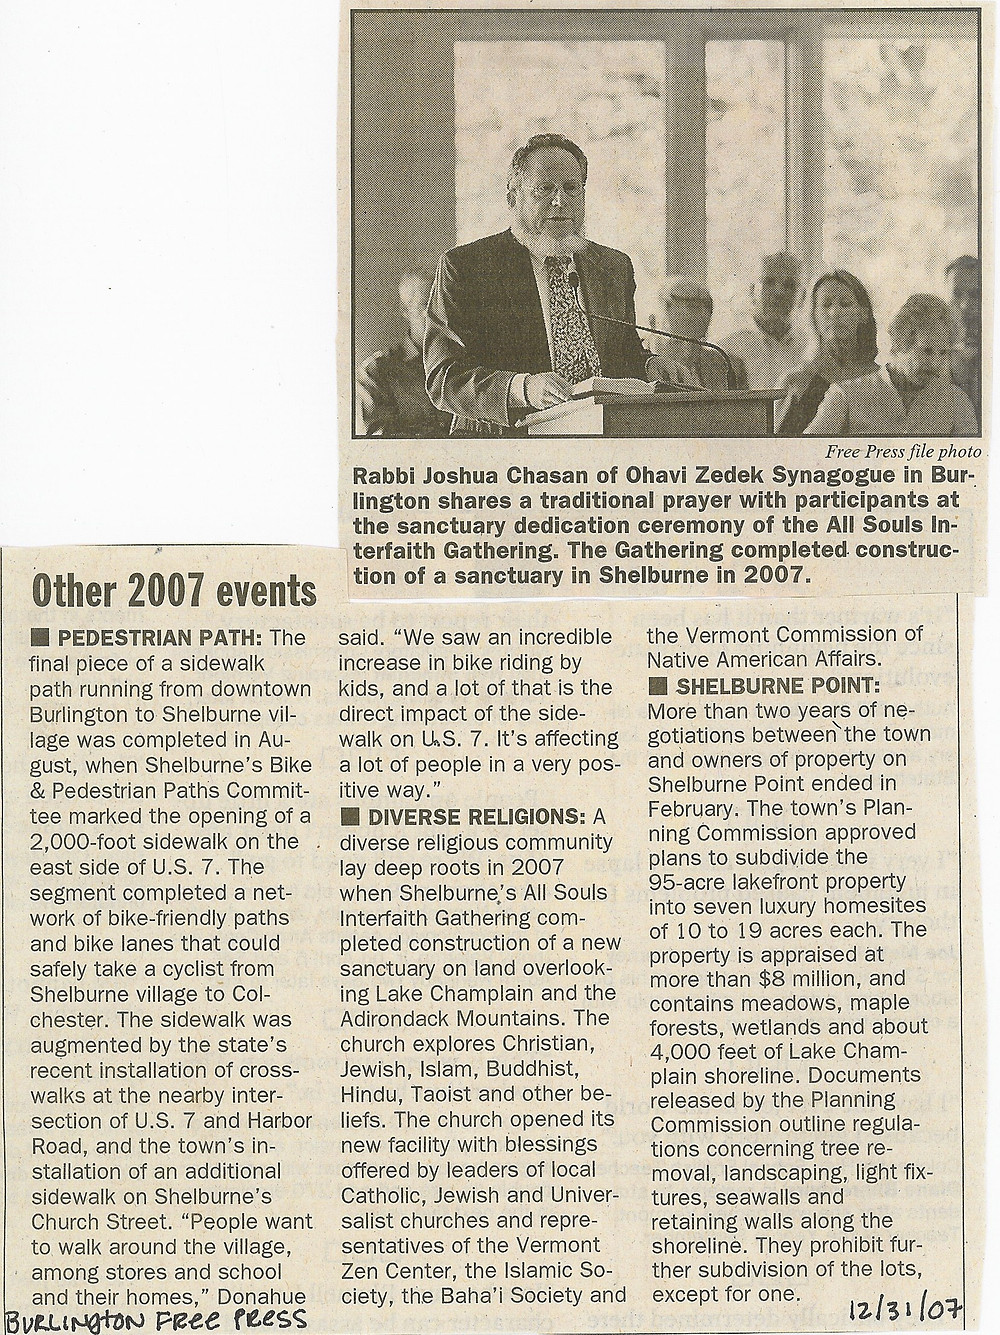 2007.12.31 2007 Other Events, Diverse Religions - Burlington Free Press 12_31_07